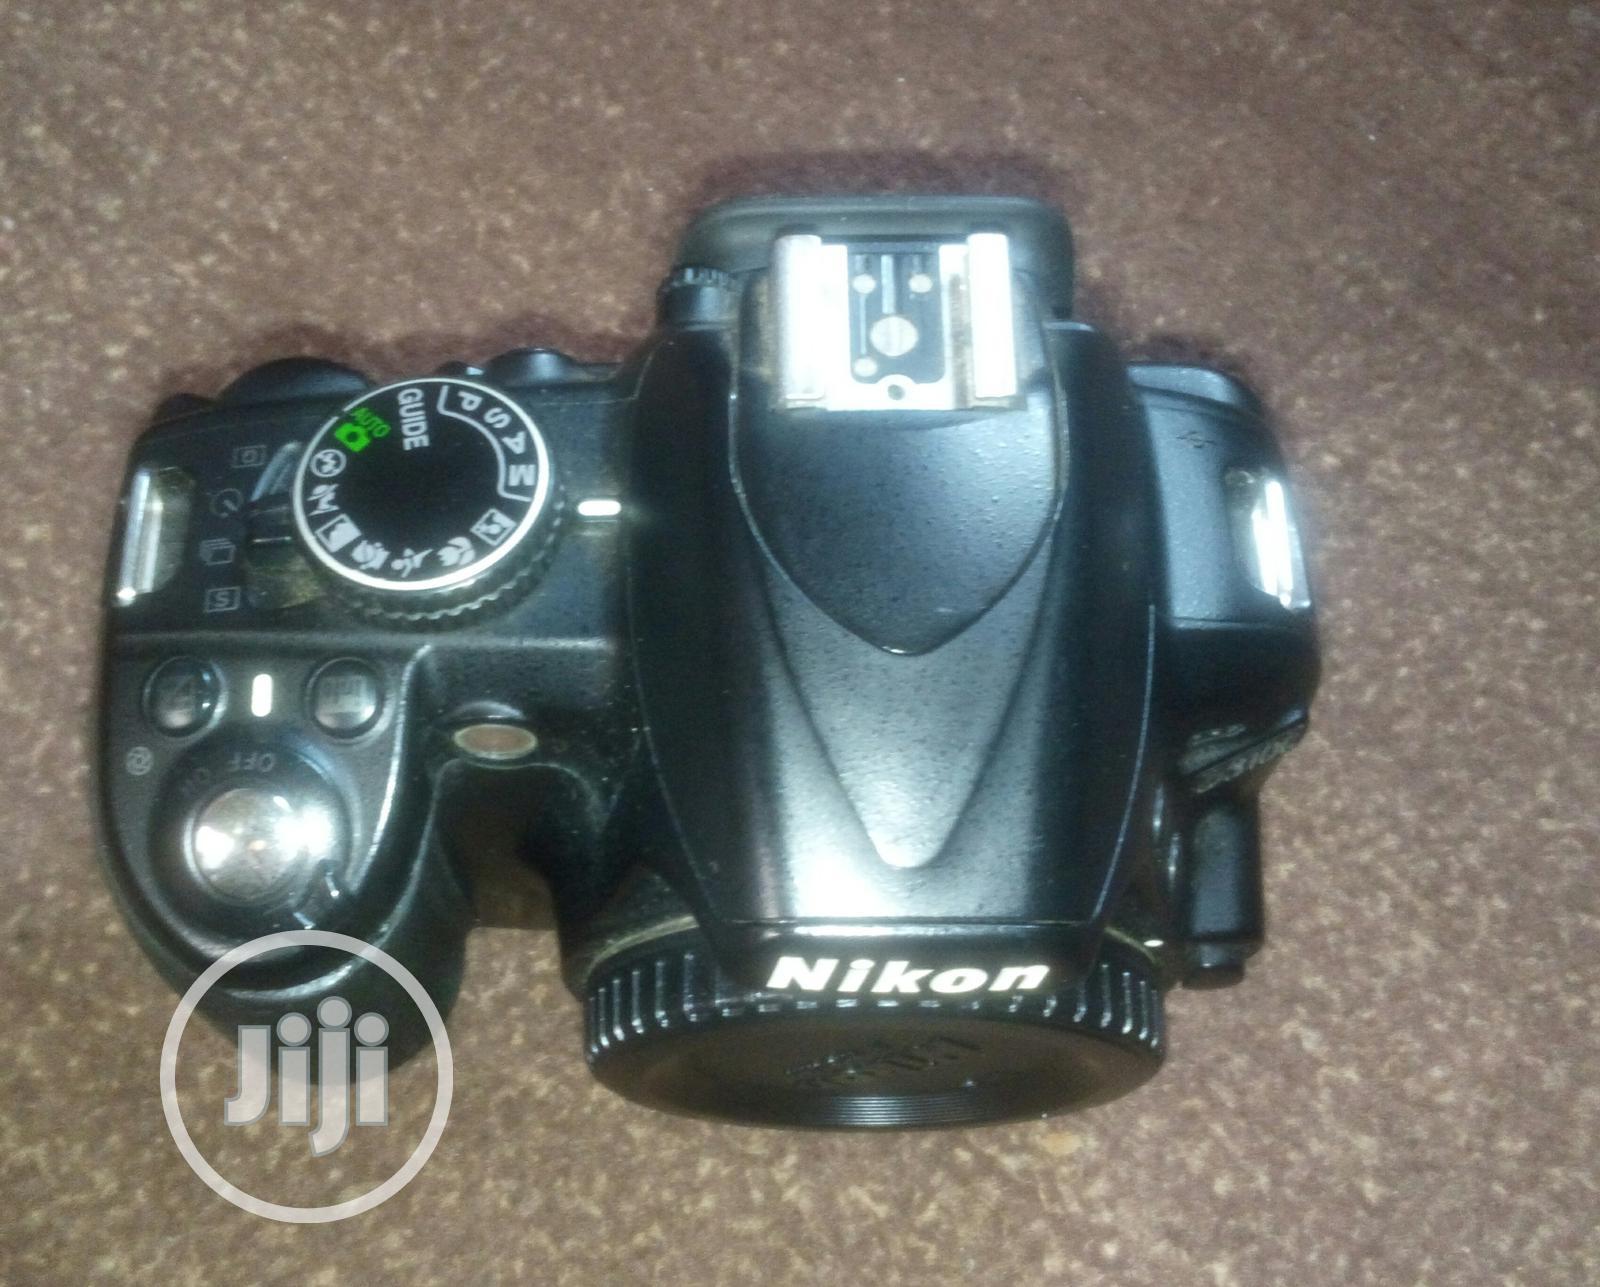 Nikon D3100   Photo & Video Cameras for sale in Ikorodu, Lagos State, Nigeria